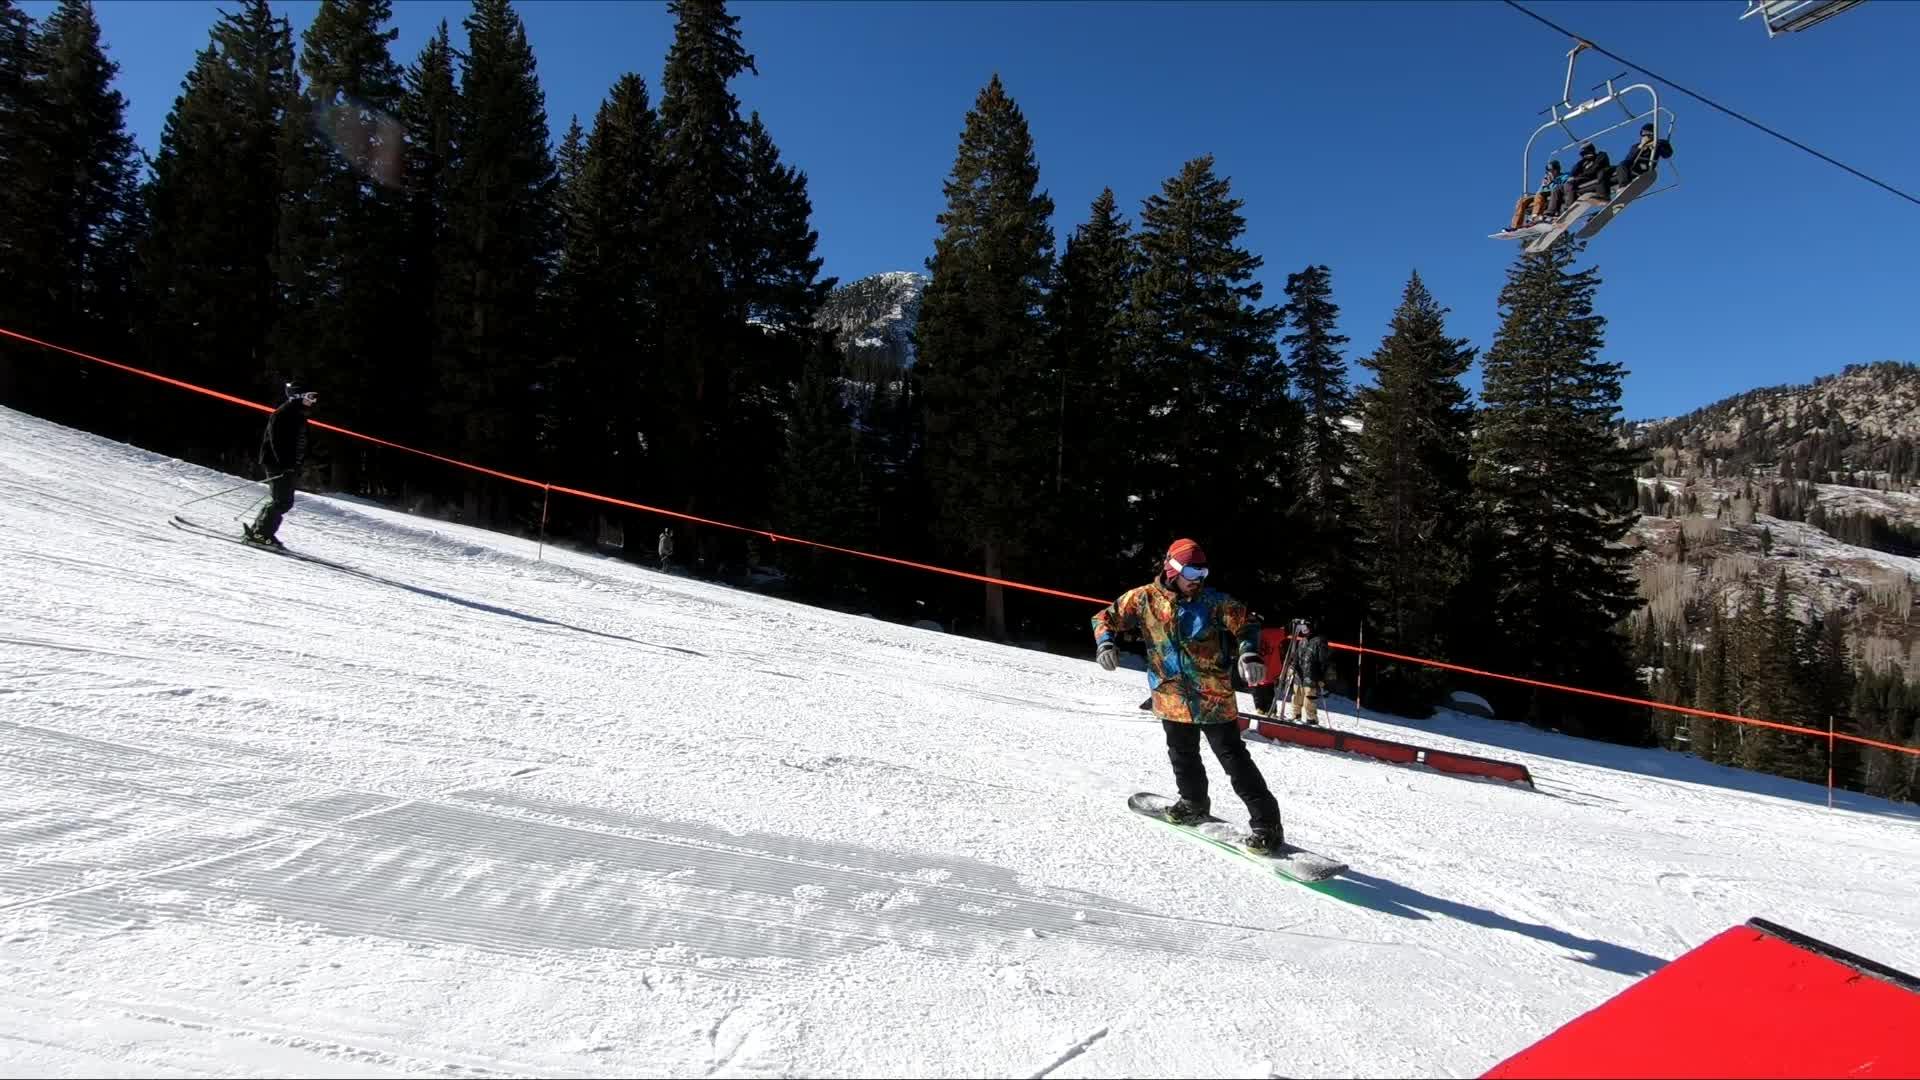 ski, skiing, snowboard, snowboarding, sports, Untitled GIFs